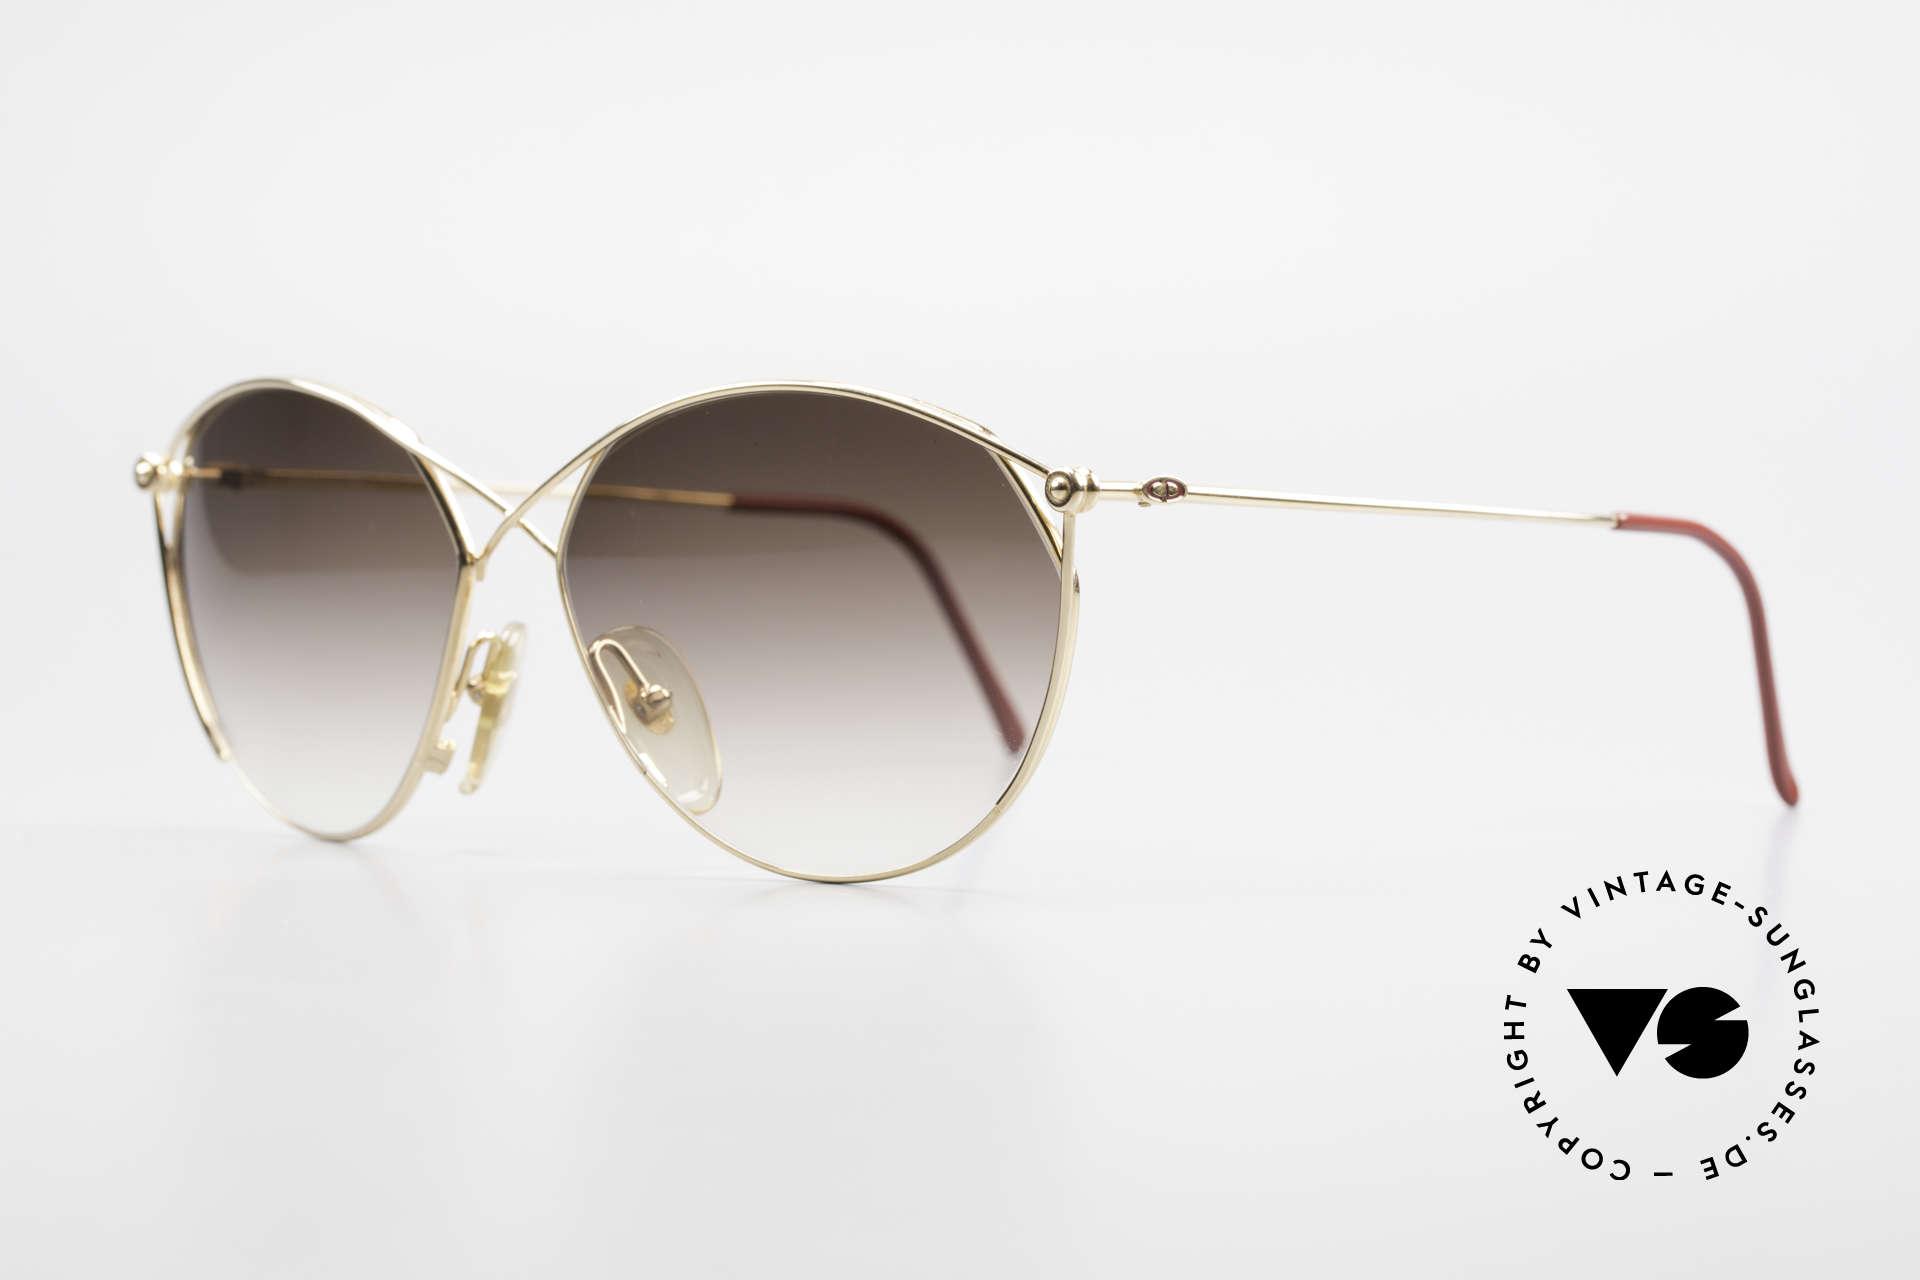 Christian Dior 2390 Ladies Designer Sunglasses, hard GOLD-PLATED metal frame, full of verve!, Made for Women